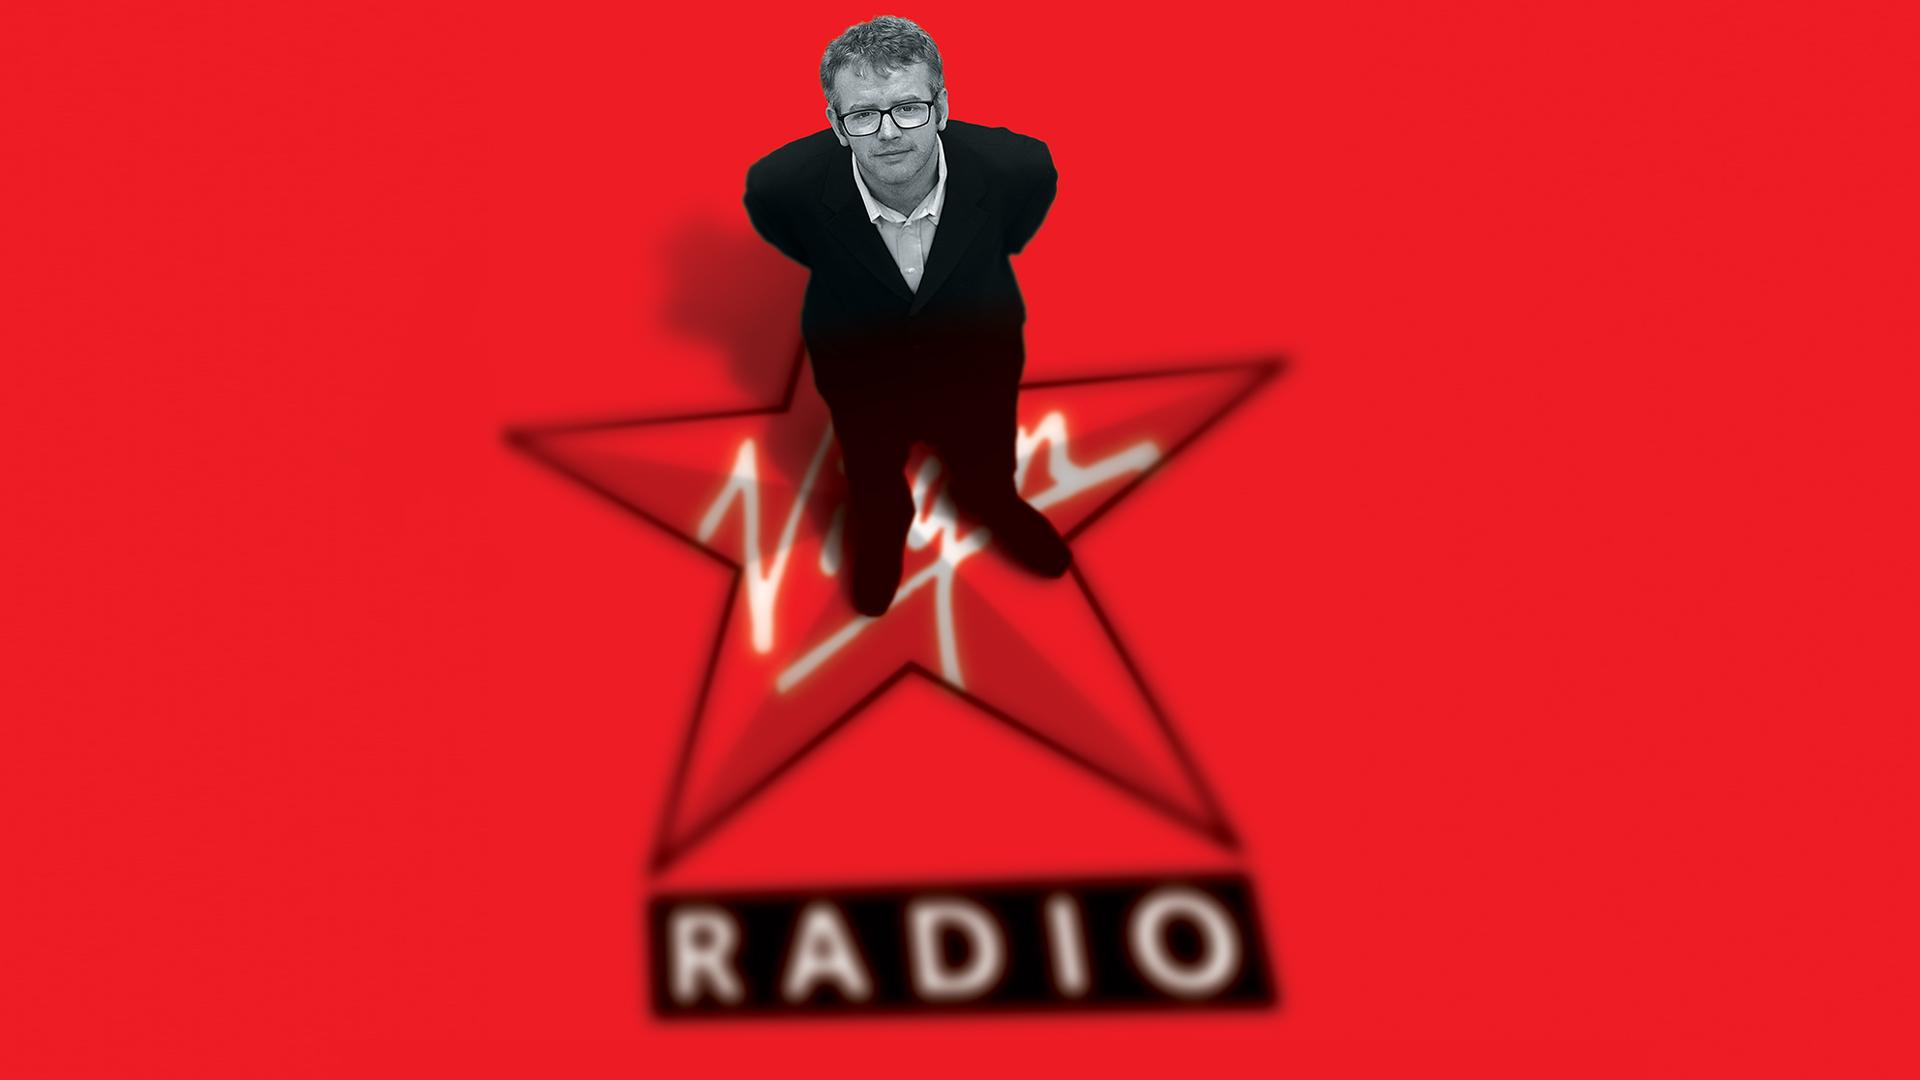 Thinkfarm branding for Virgin Radio featuring Chris Evans